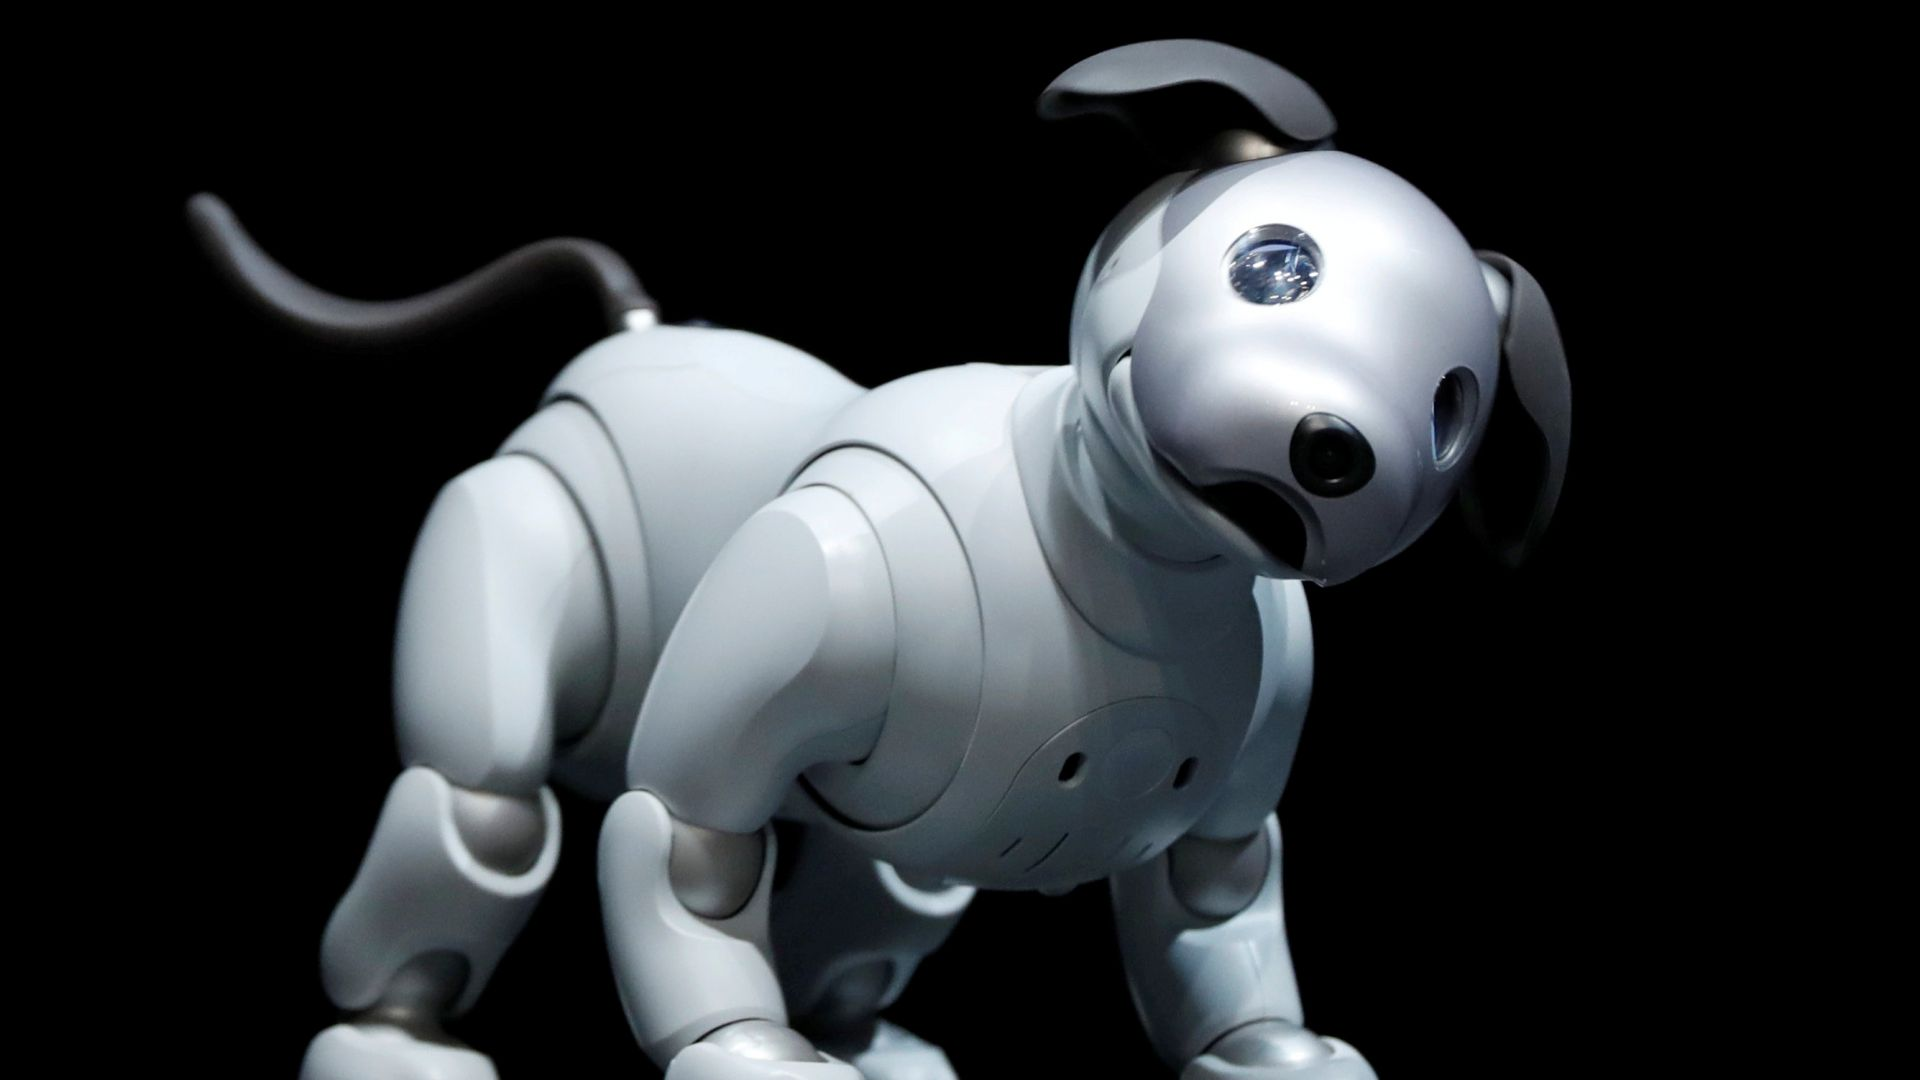 Android - любимый робот